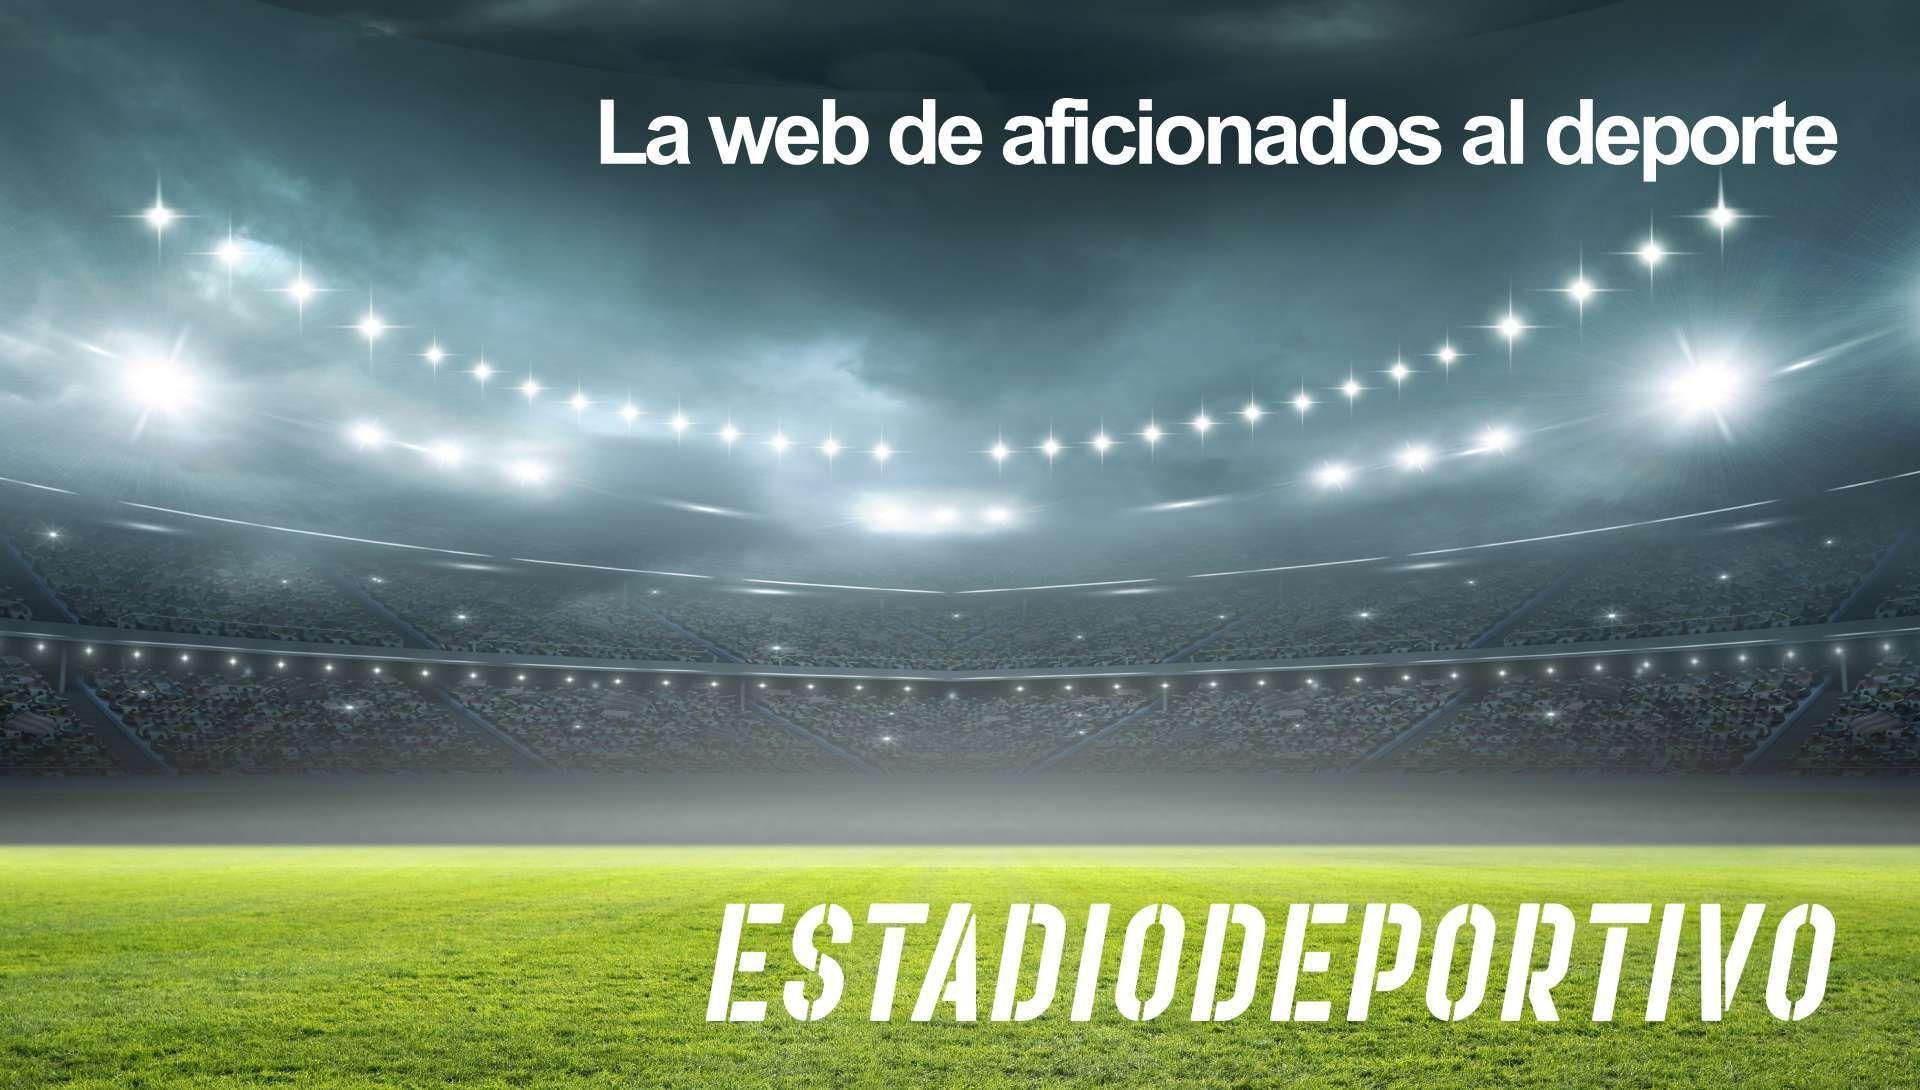 El valor de mercado de la plantilla del Sevilla FC